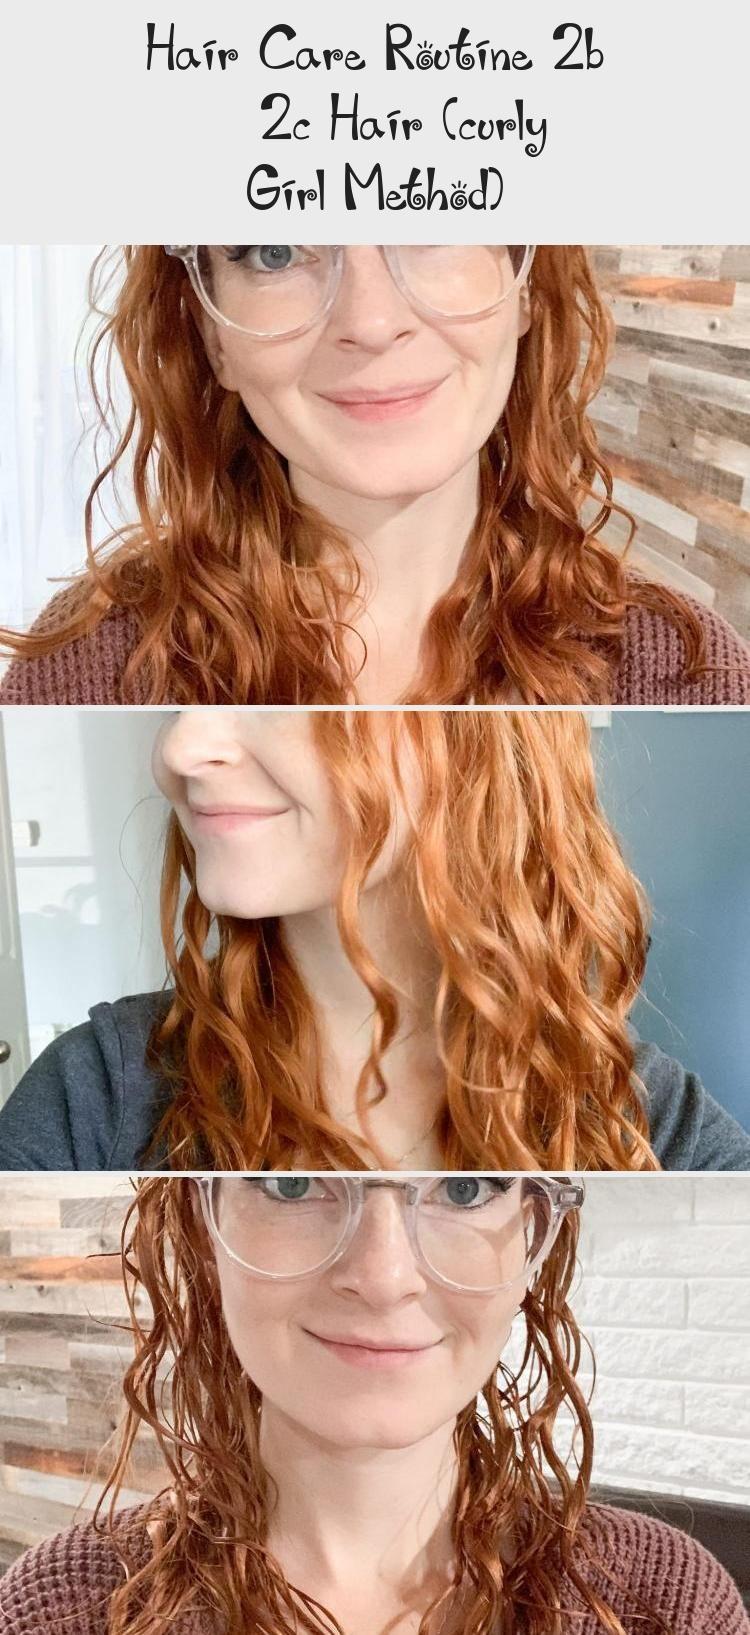 Hair Care Routine 2b 2c Hair (curly Girl Method in 2020